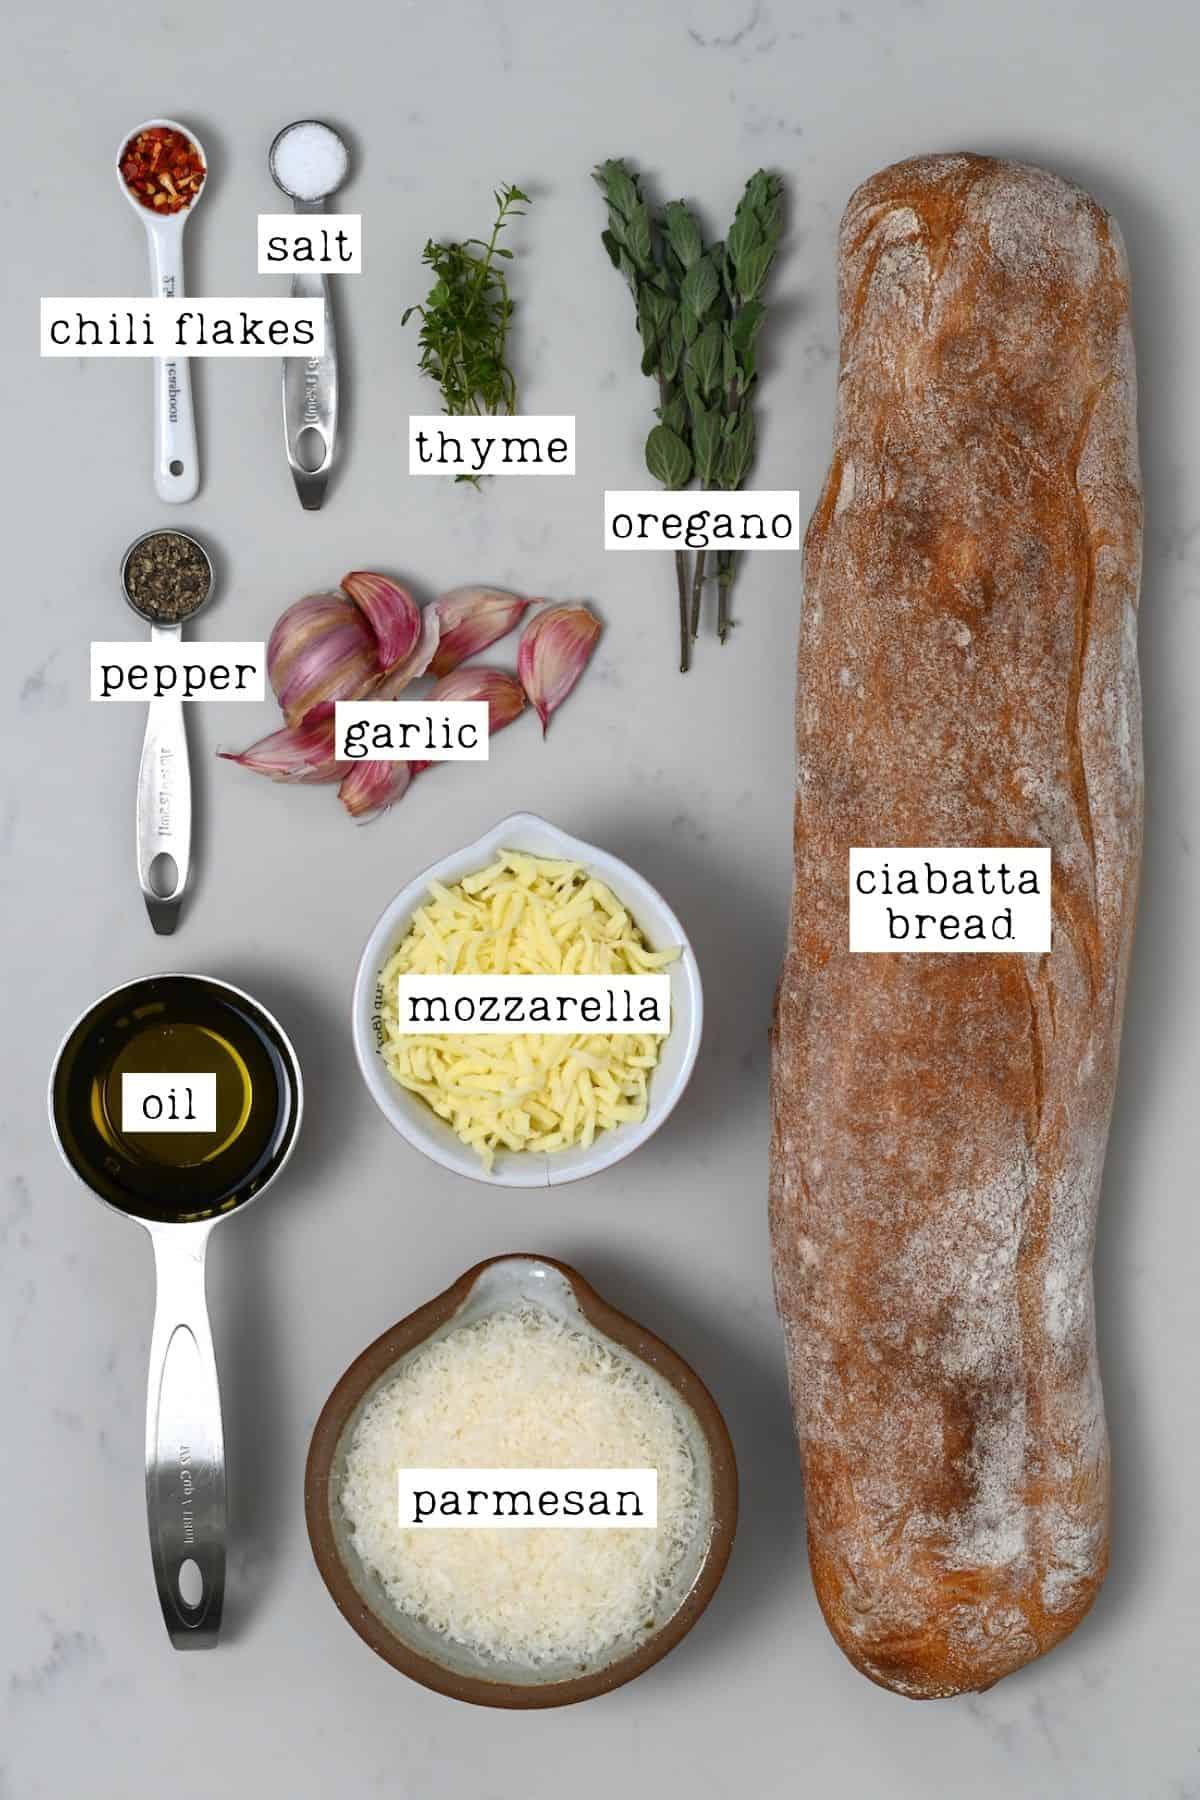 Ingredients for cheesy garlic bread